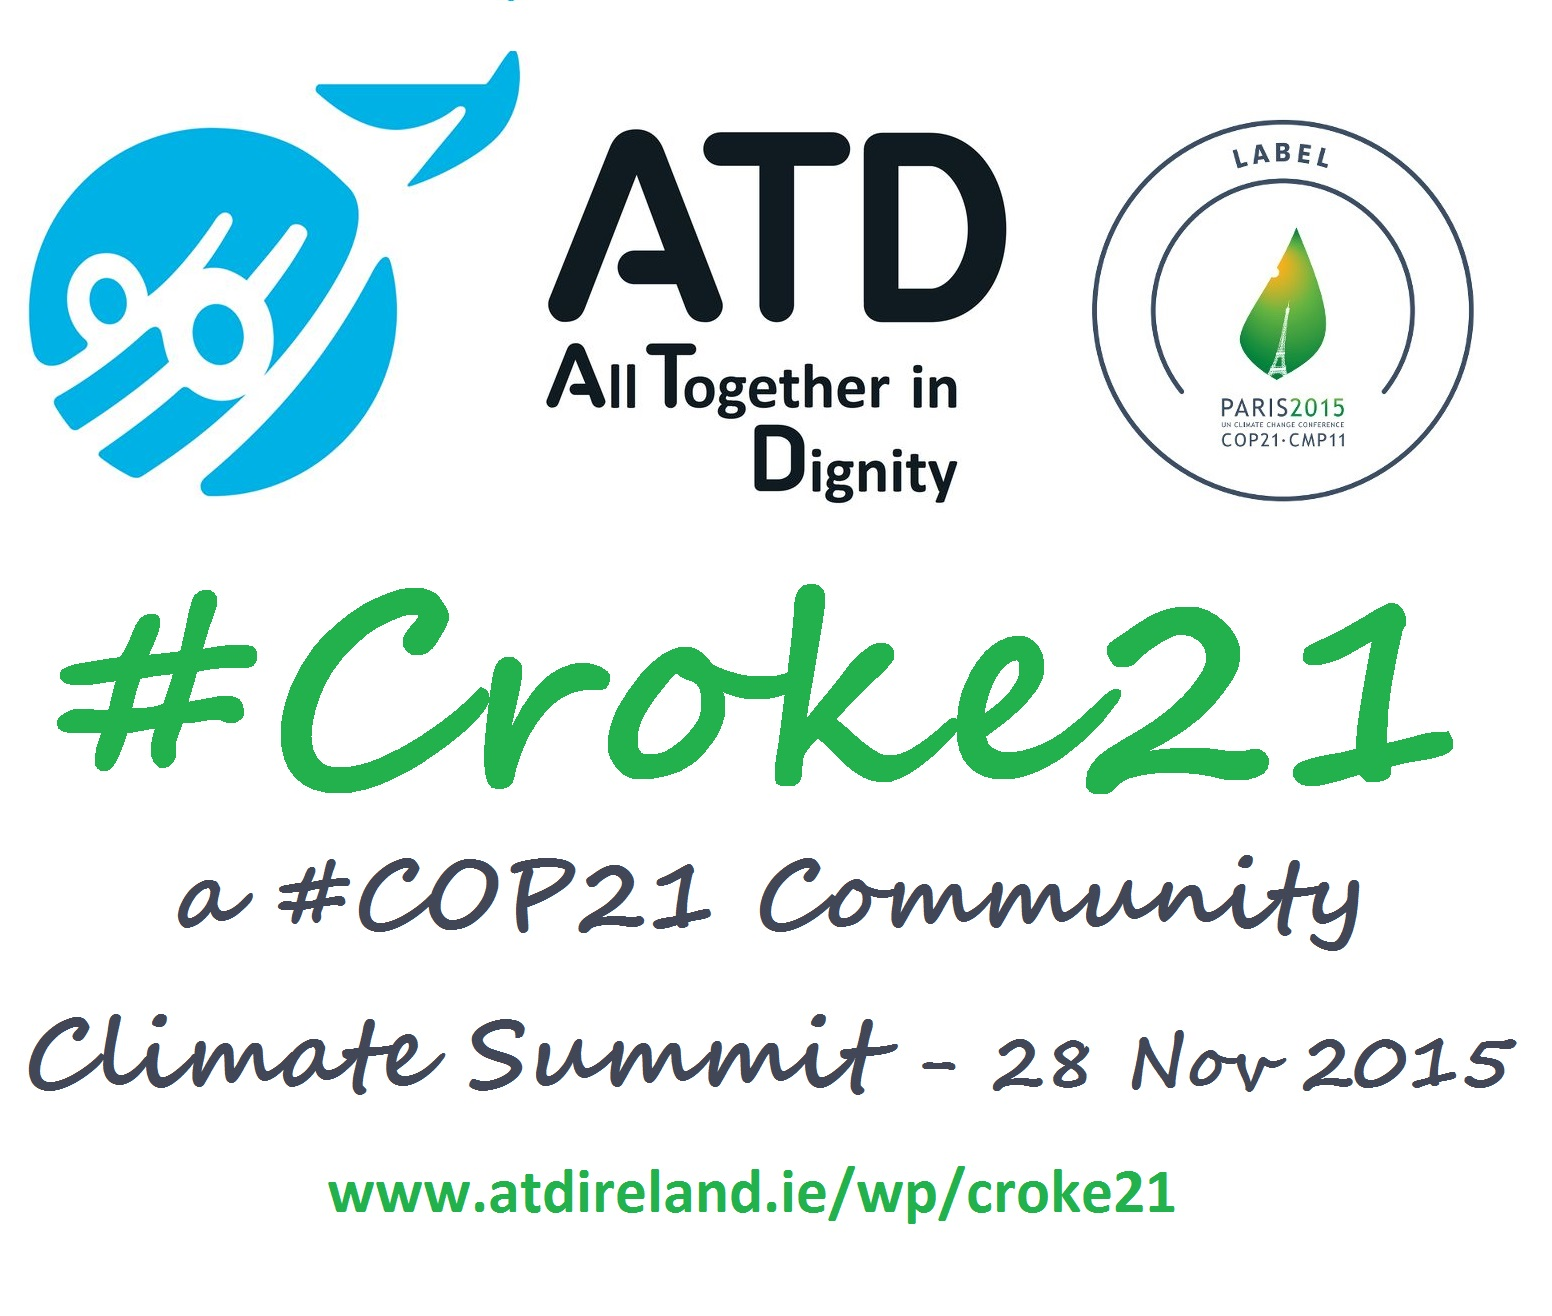 Croke21